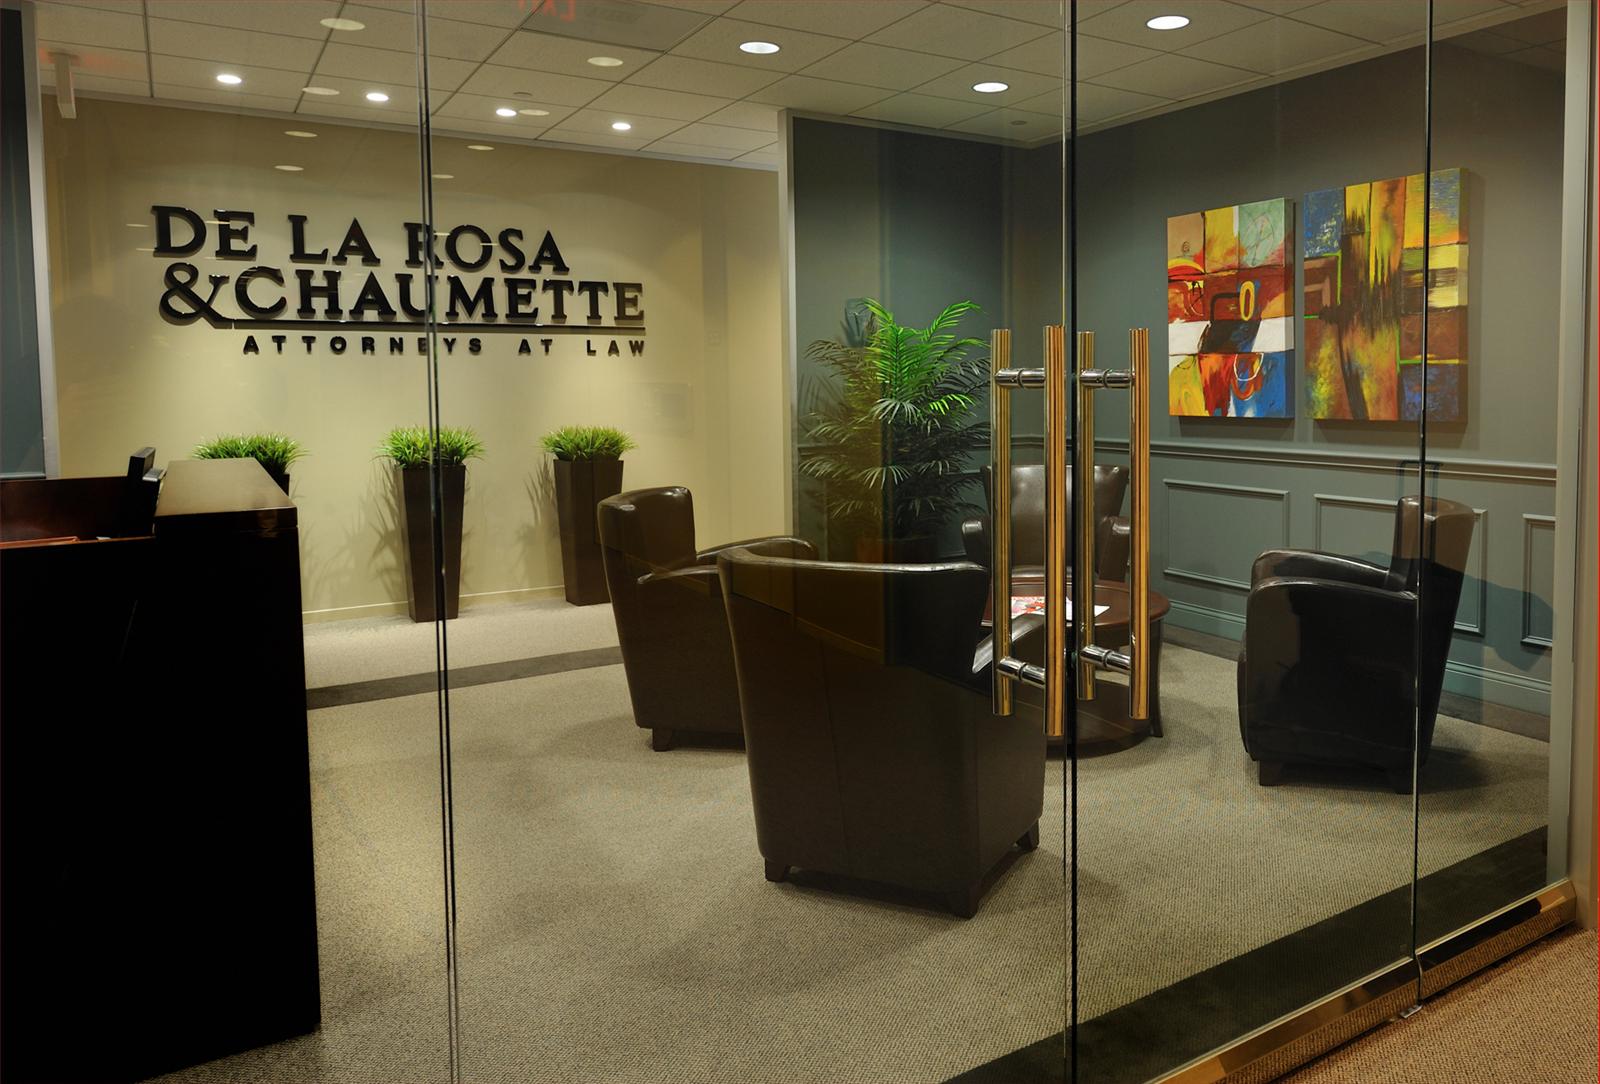 Reception Design Law Office Decor Law Office Design Masculine